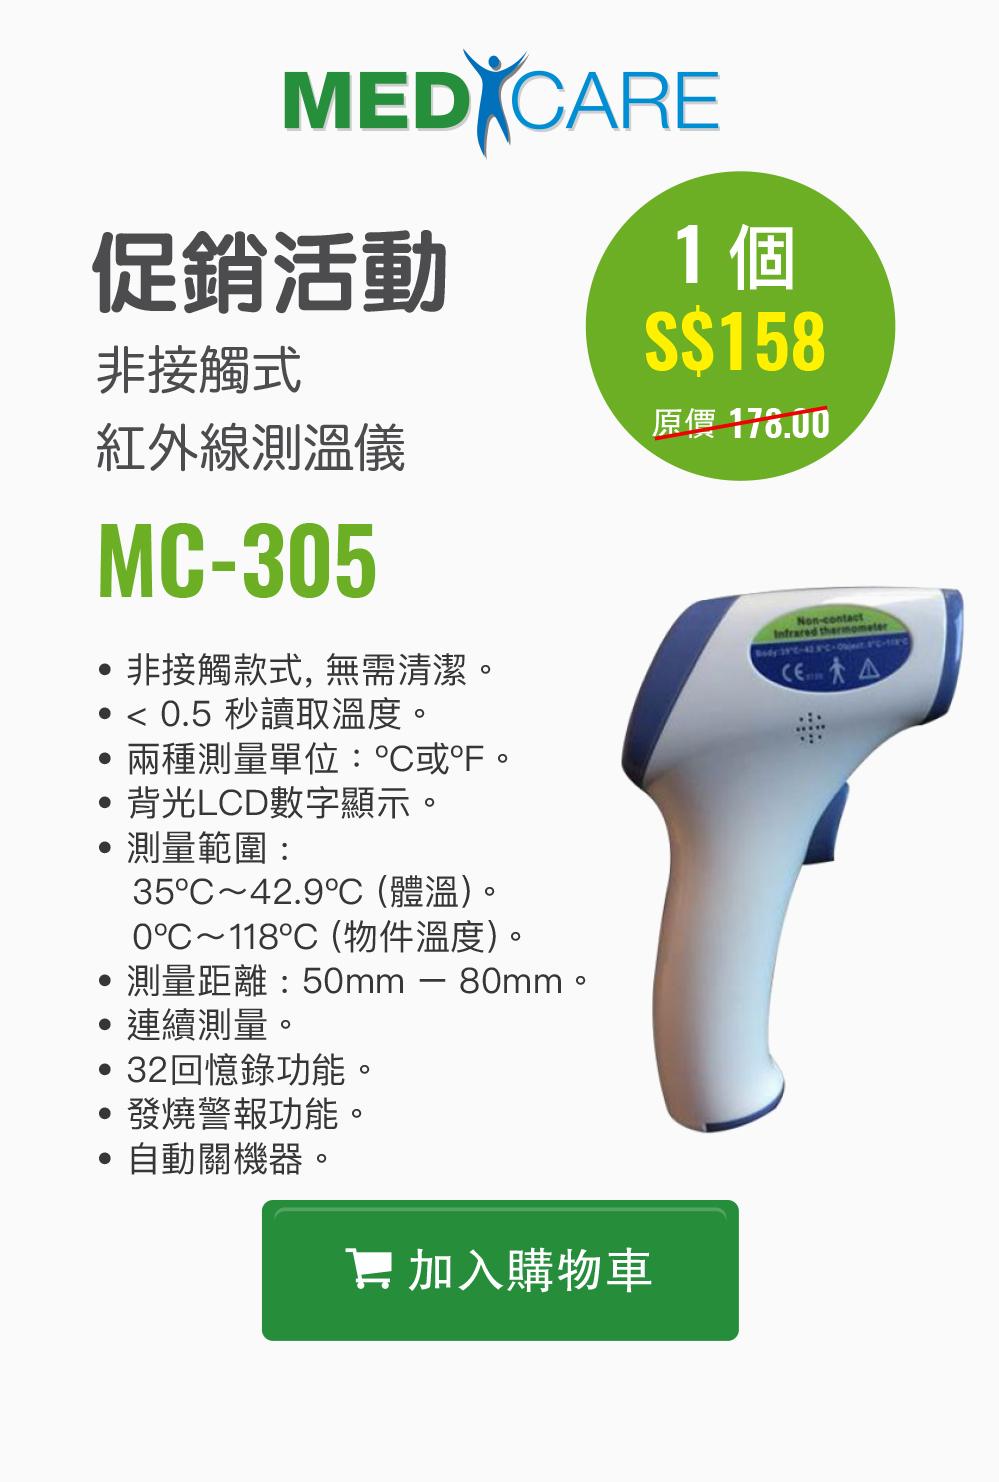 mc-305